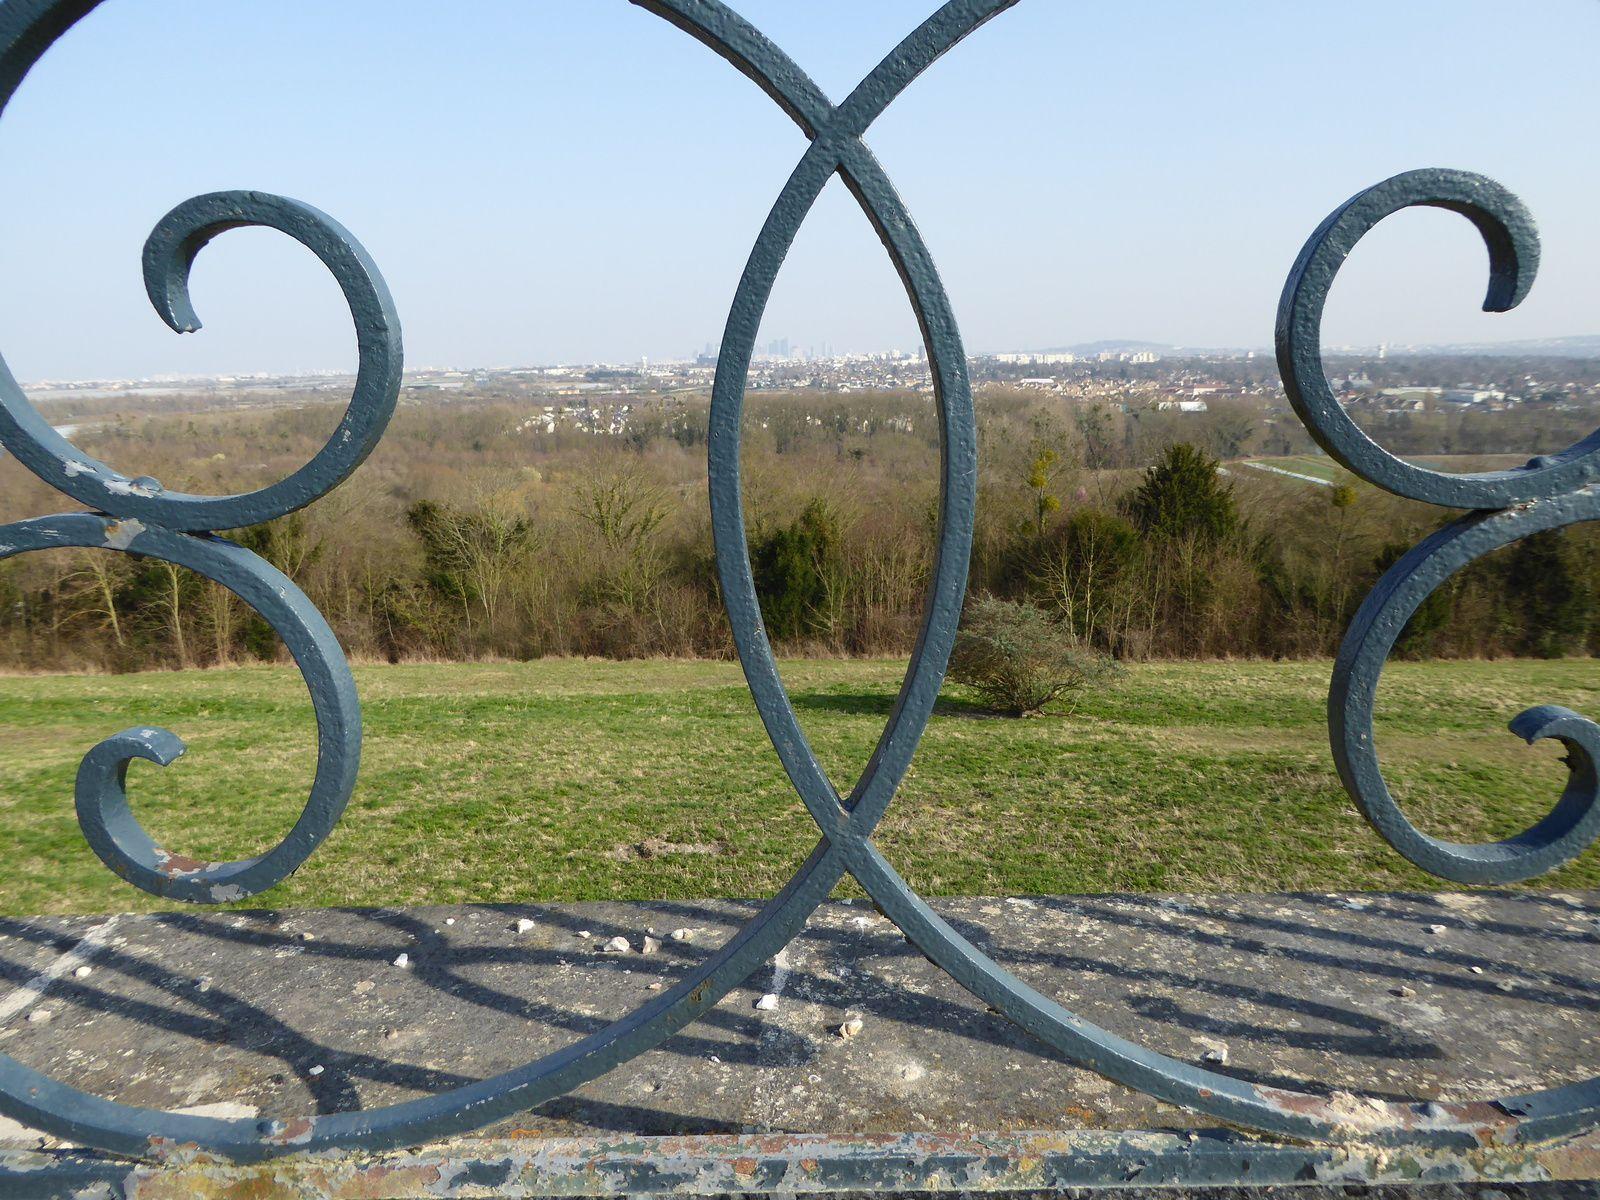 Randonnée d'Herblay à Saint-Germain-en-Laye, 23 km - 2/2